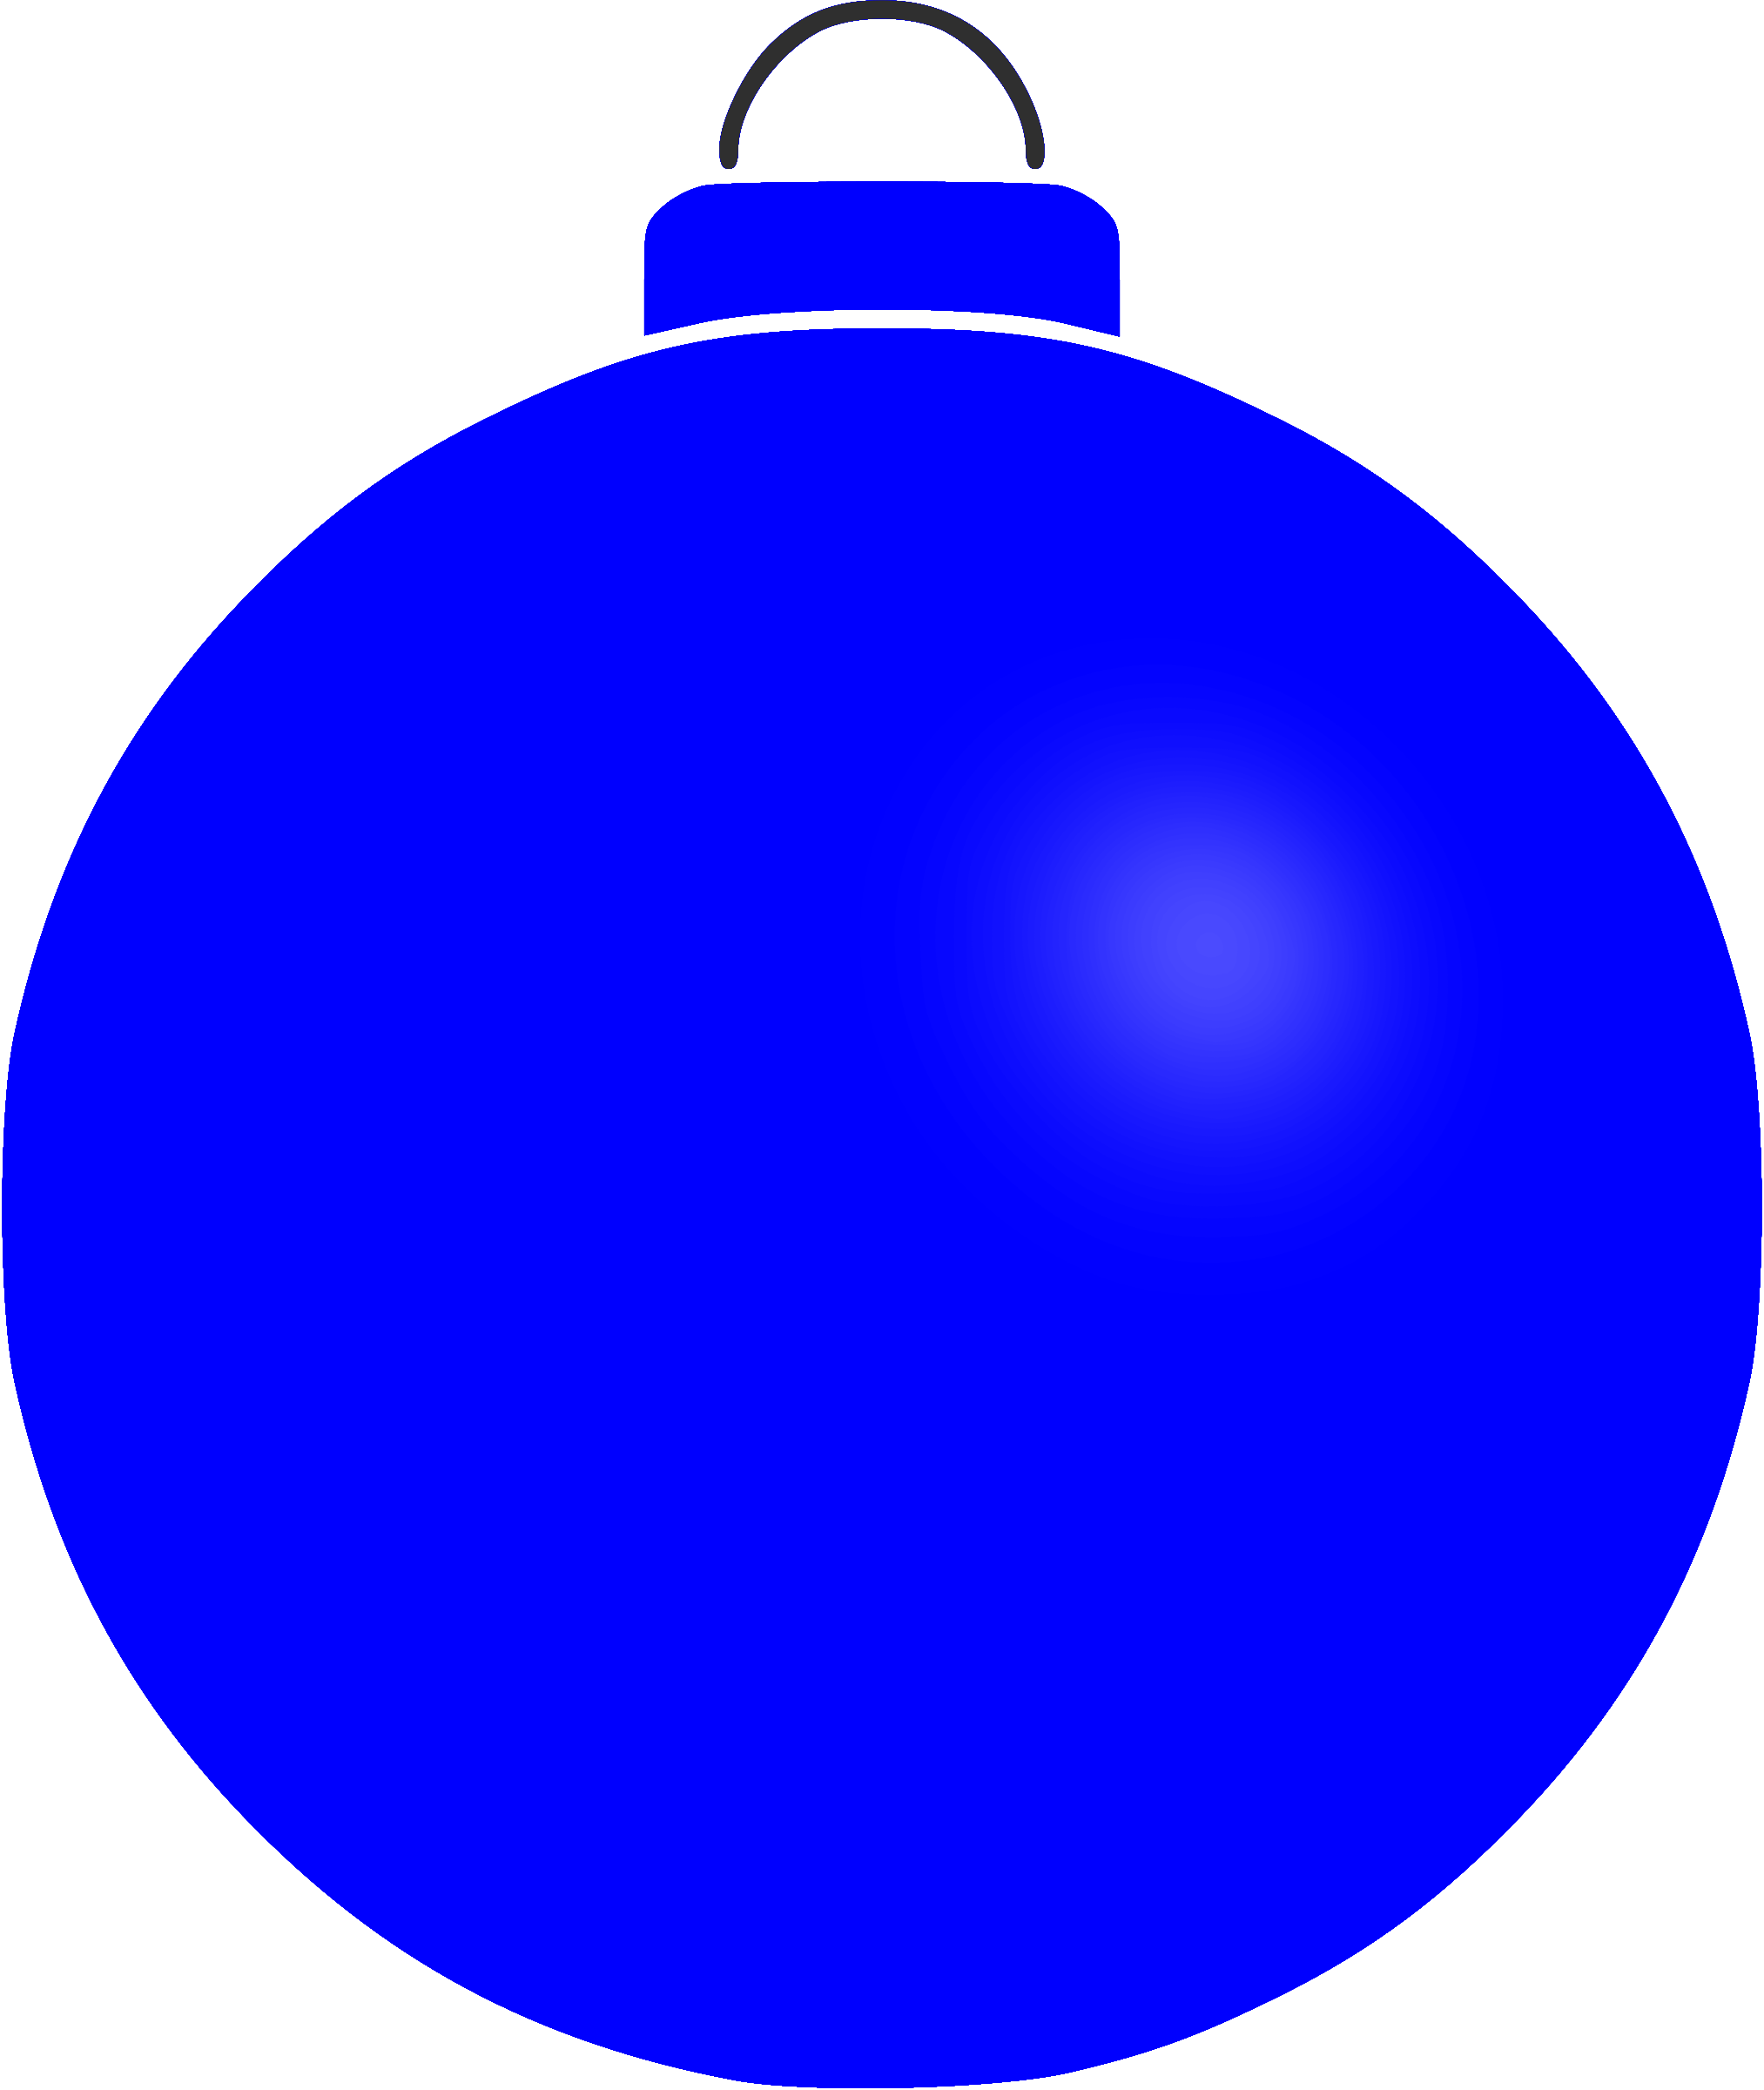 Bauble big image png. Circle clipart plain